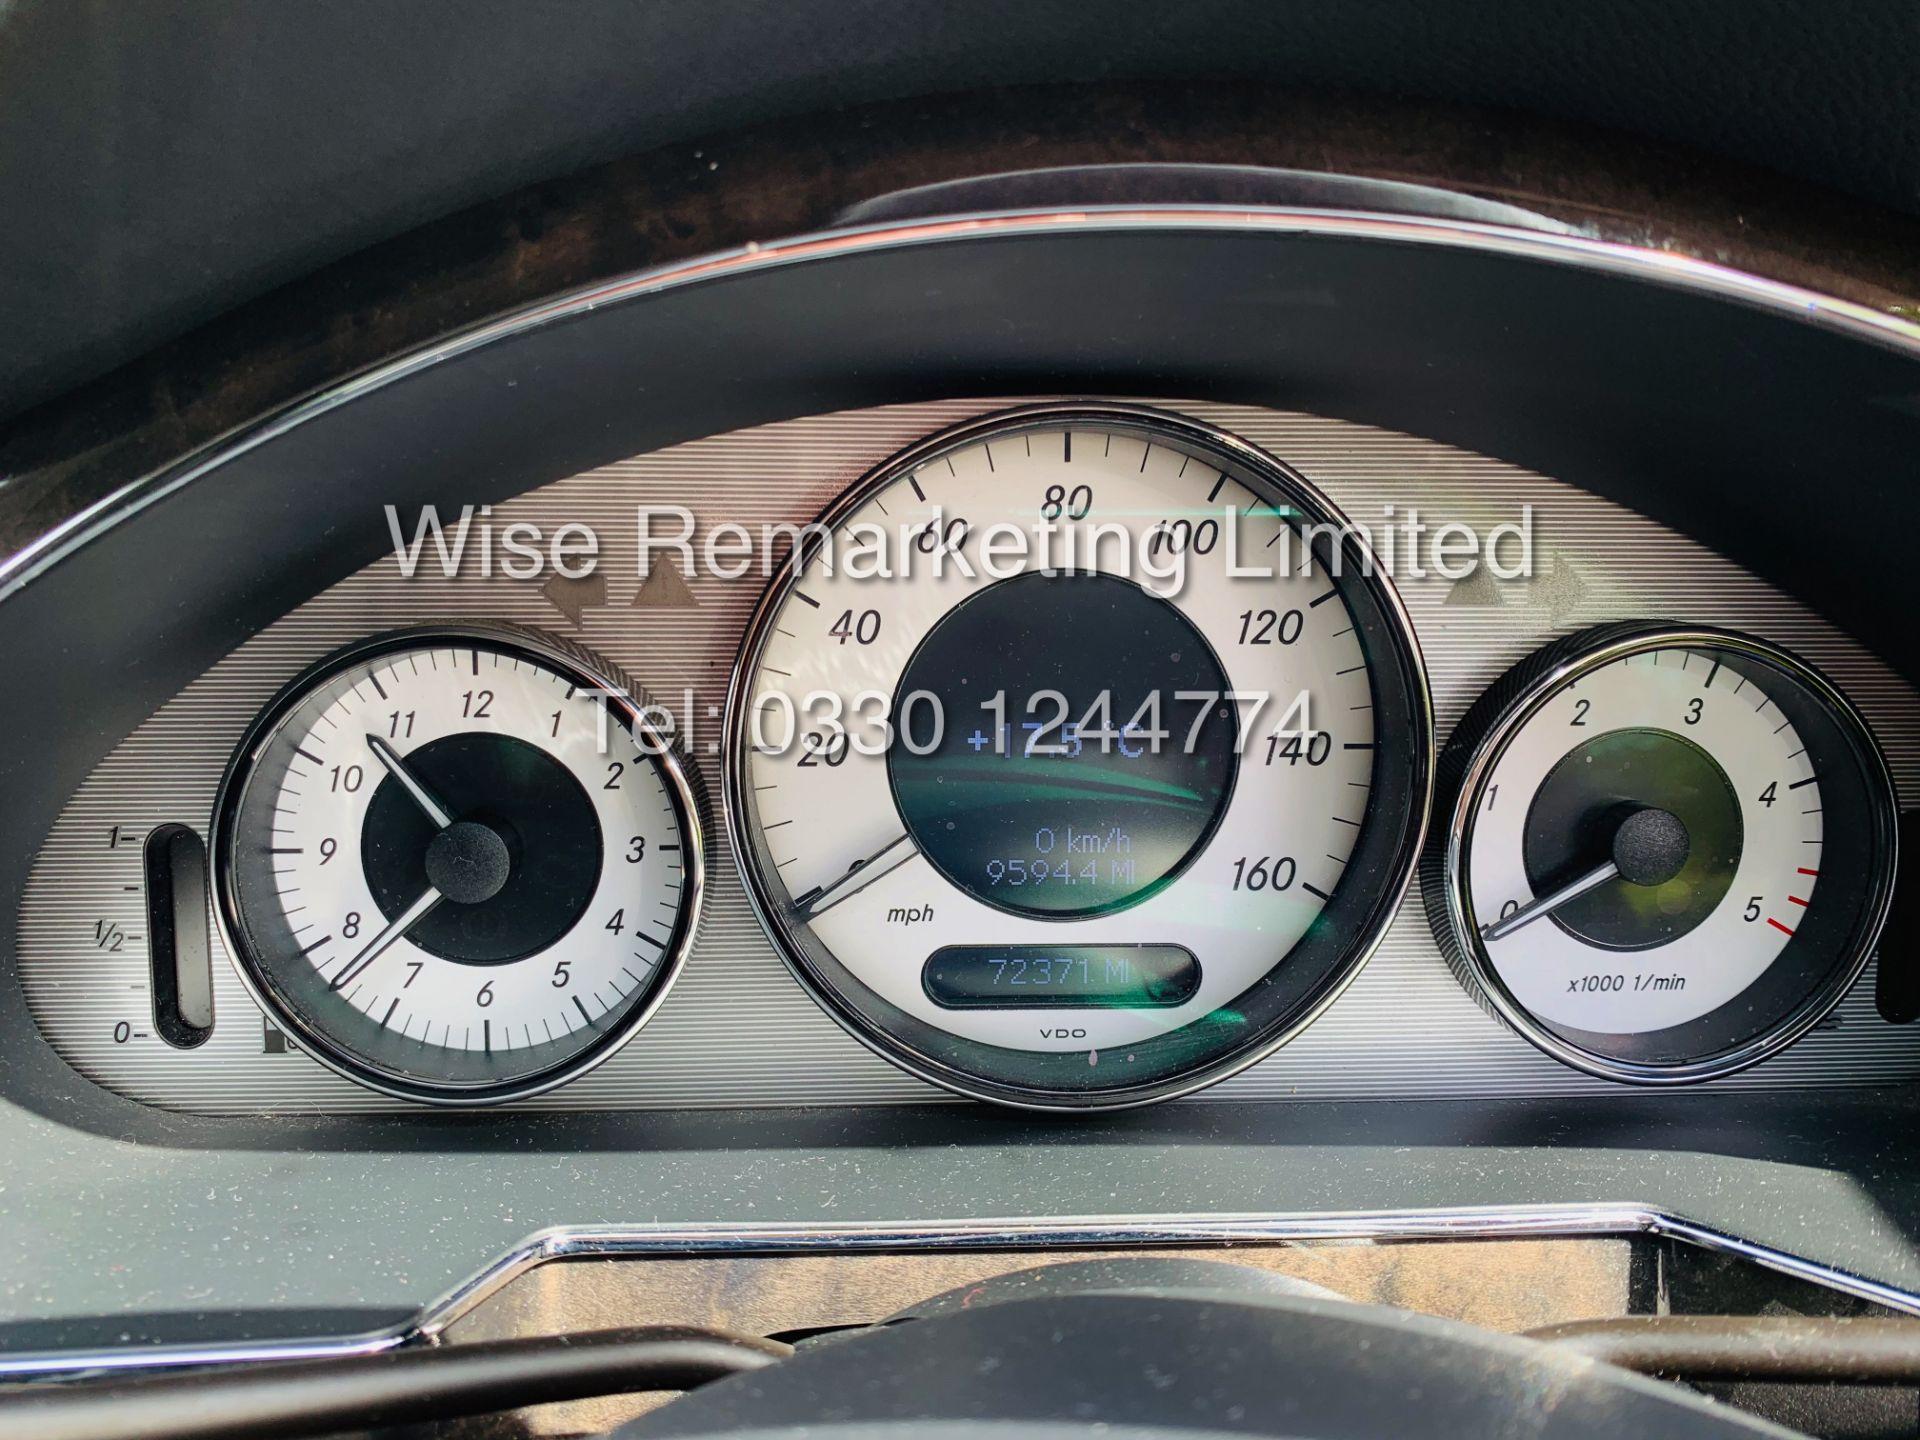 Lot 2 - * RESERVE MET* MERCEDES CLS350 CDI SPORT COUPE AUTOMATIC (BLACK EDITION) 2010 / LOW MILES / NO VAT